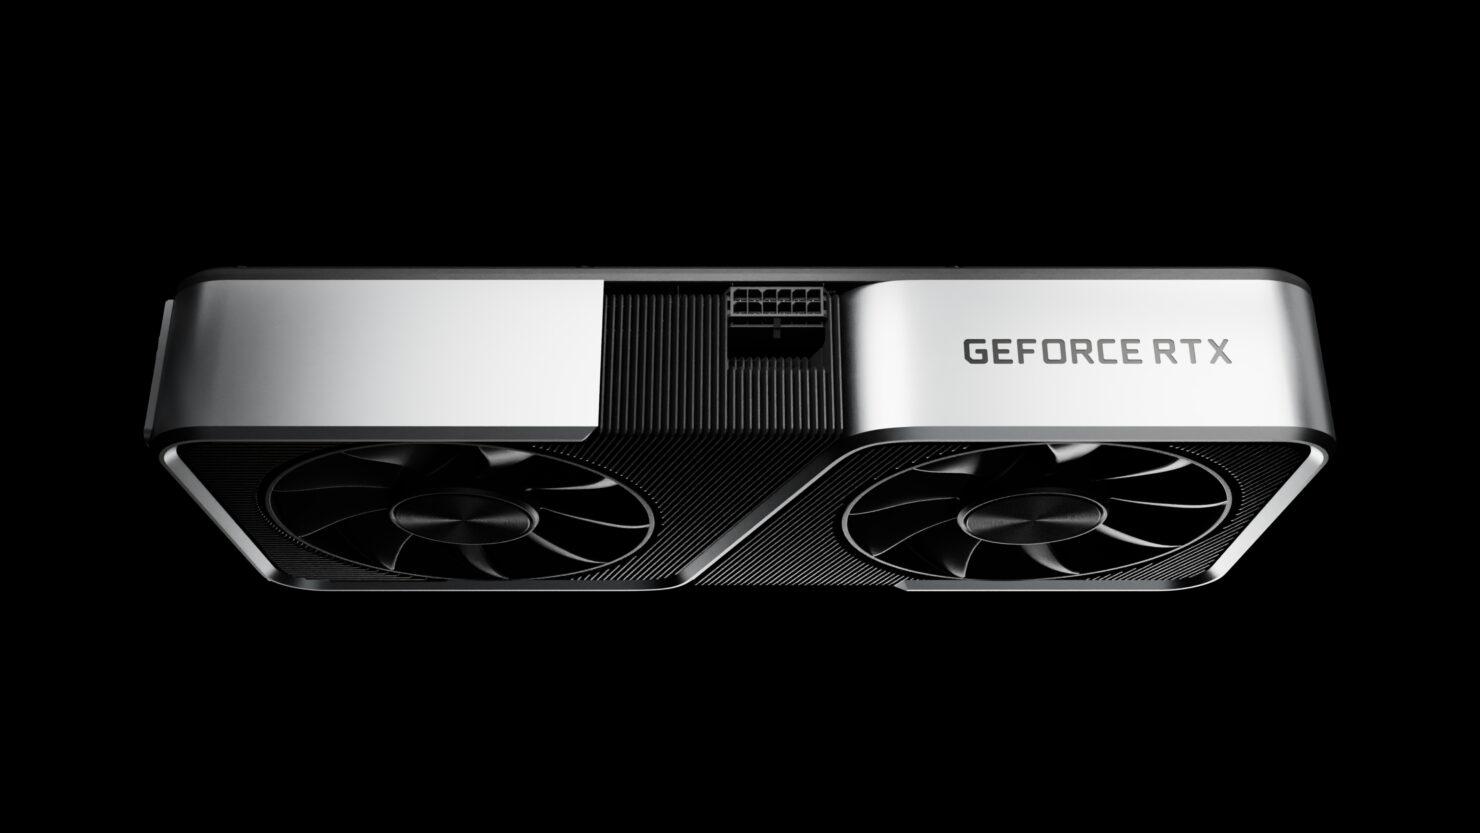 Custom GALAX & Gainward GeForce RTX 3060 Cards With NVIDIA Ampere GA104 GPUs Listed